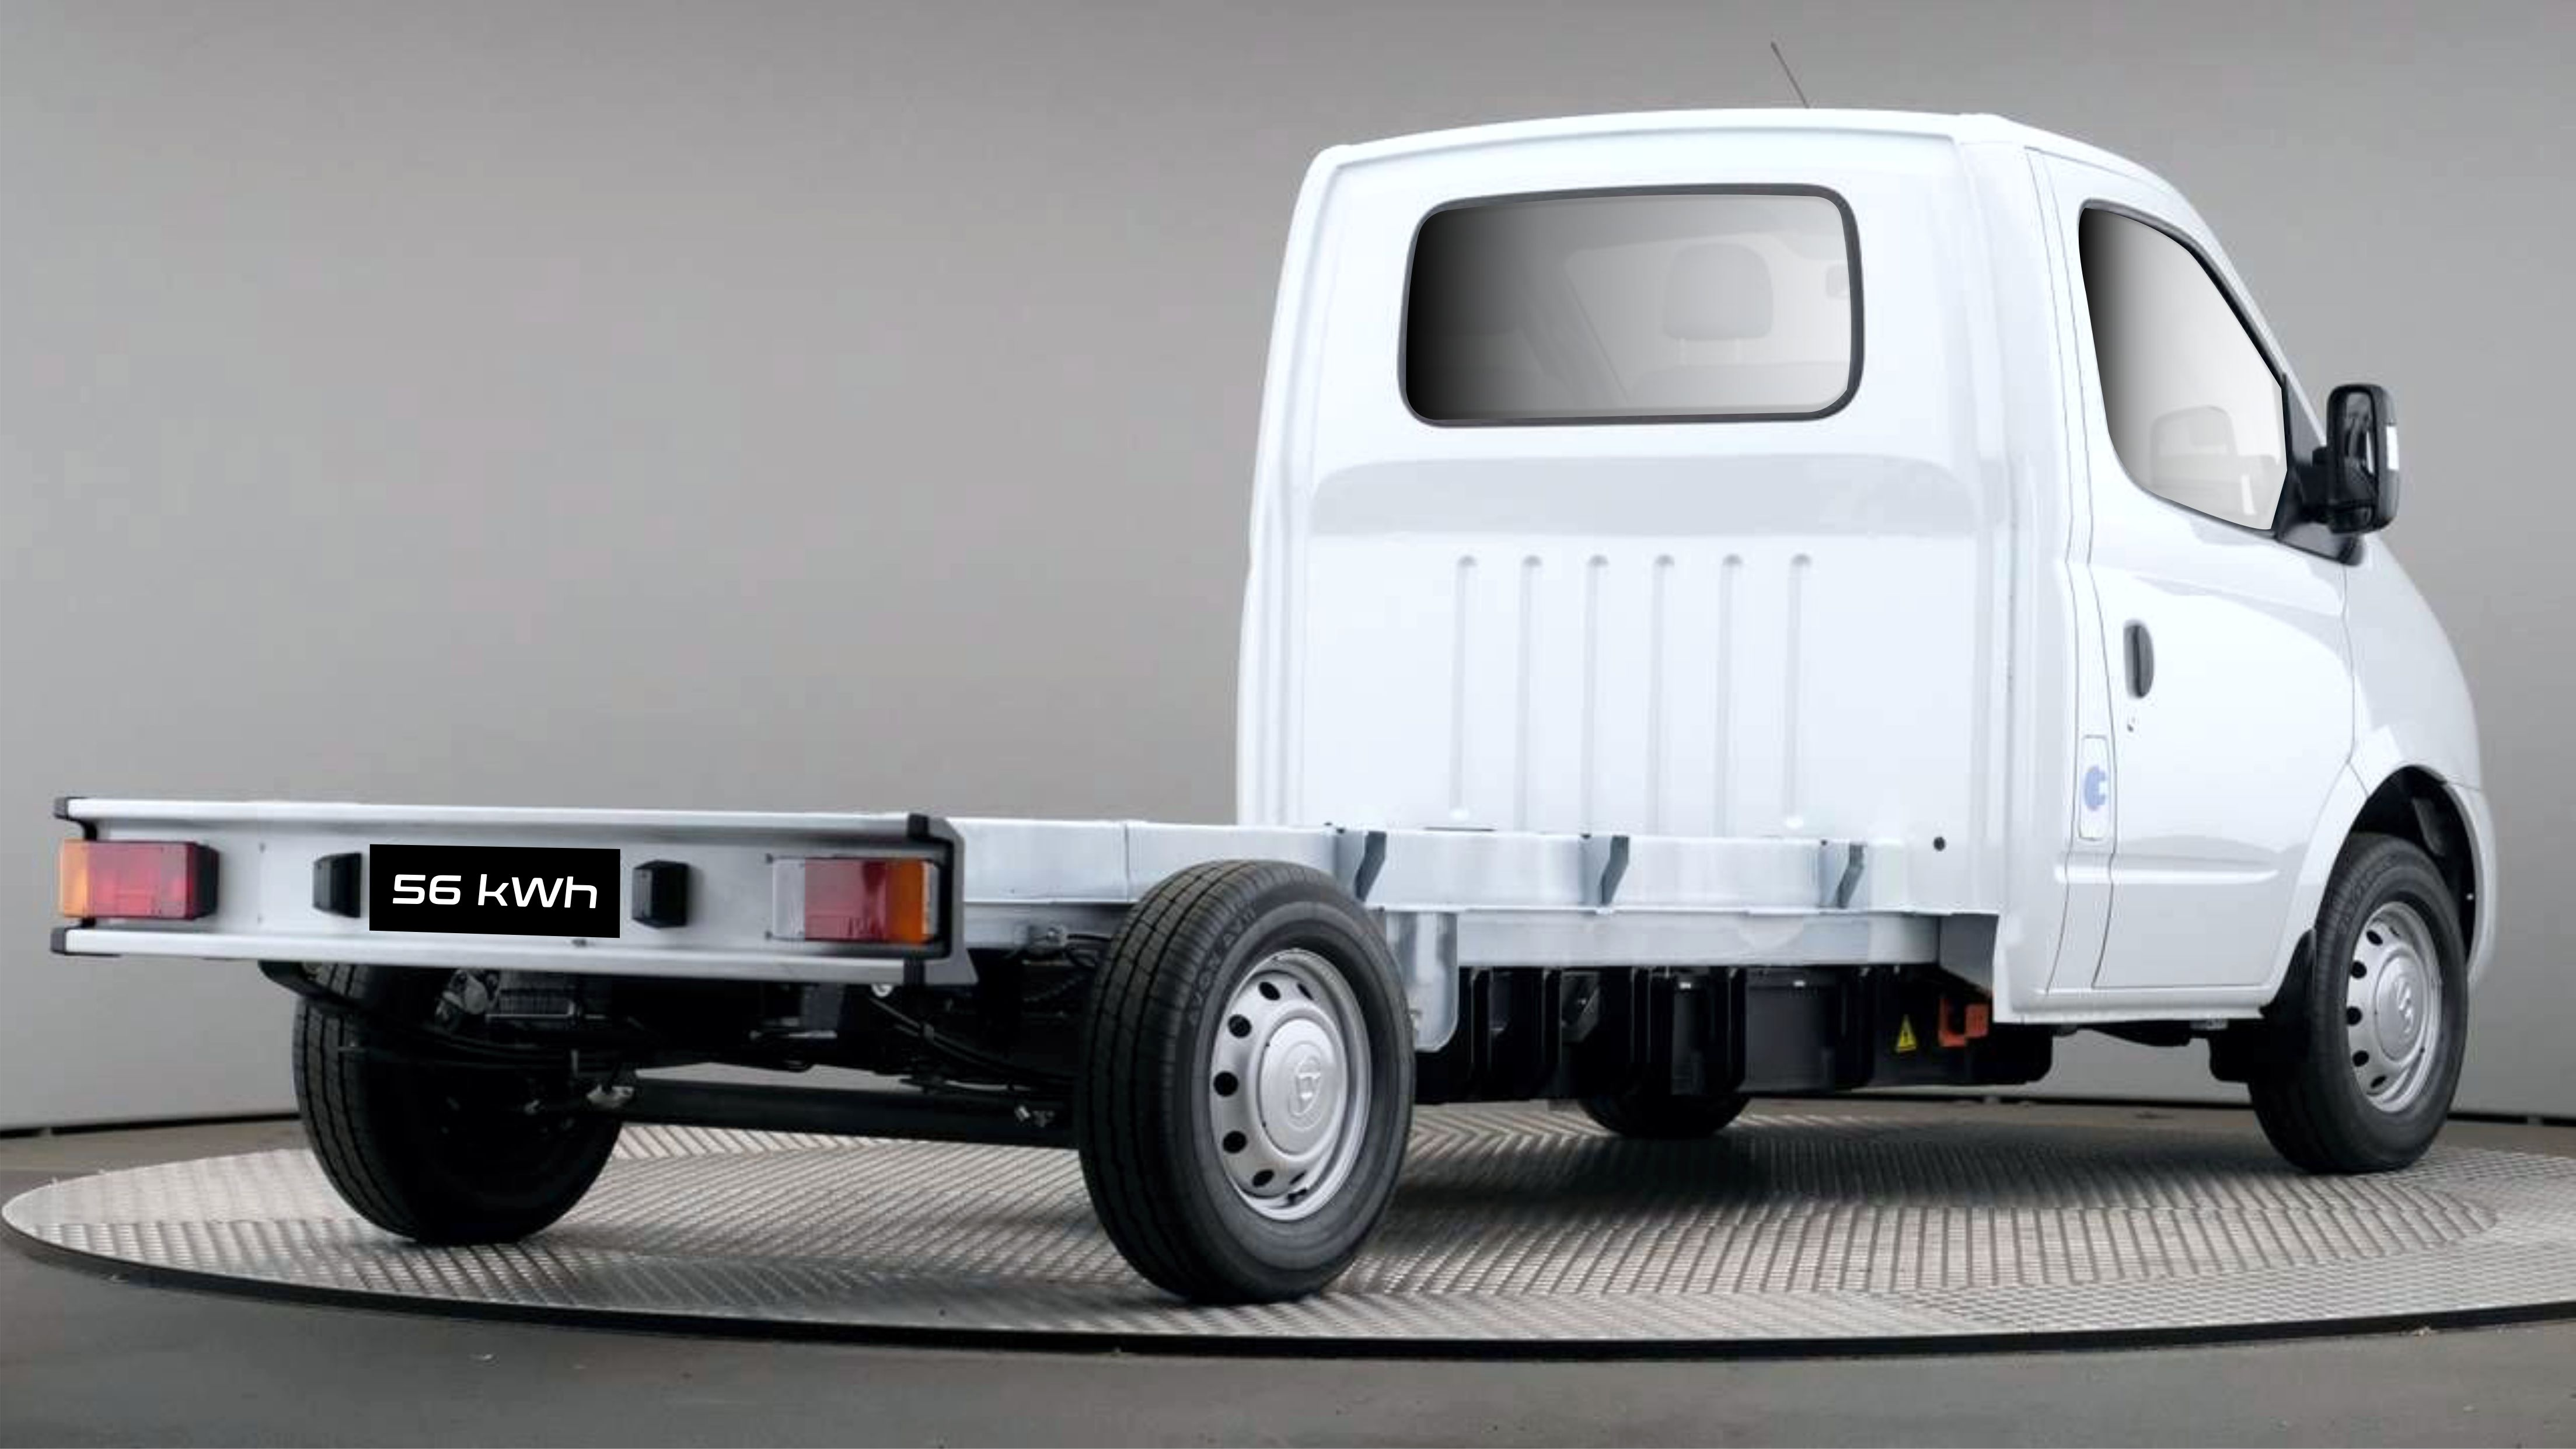 camión eléctrico Maxus EV80 camioncillo eléctrico